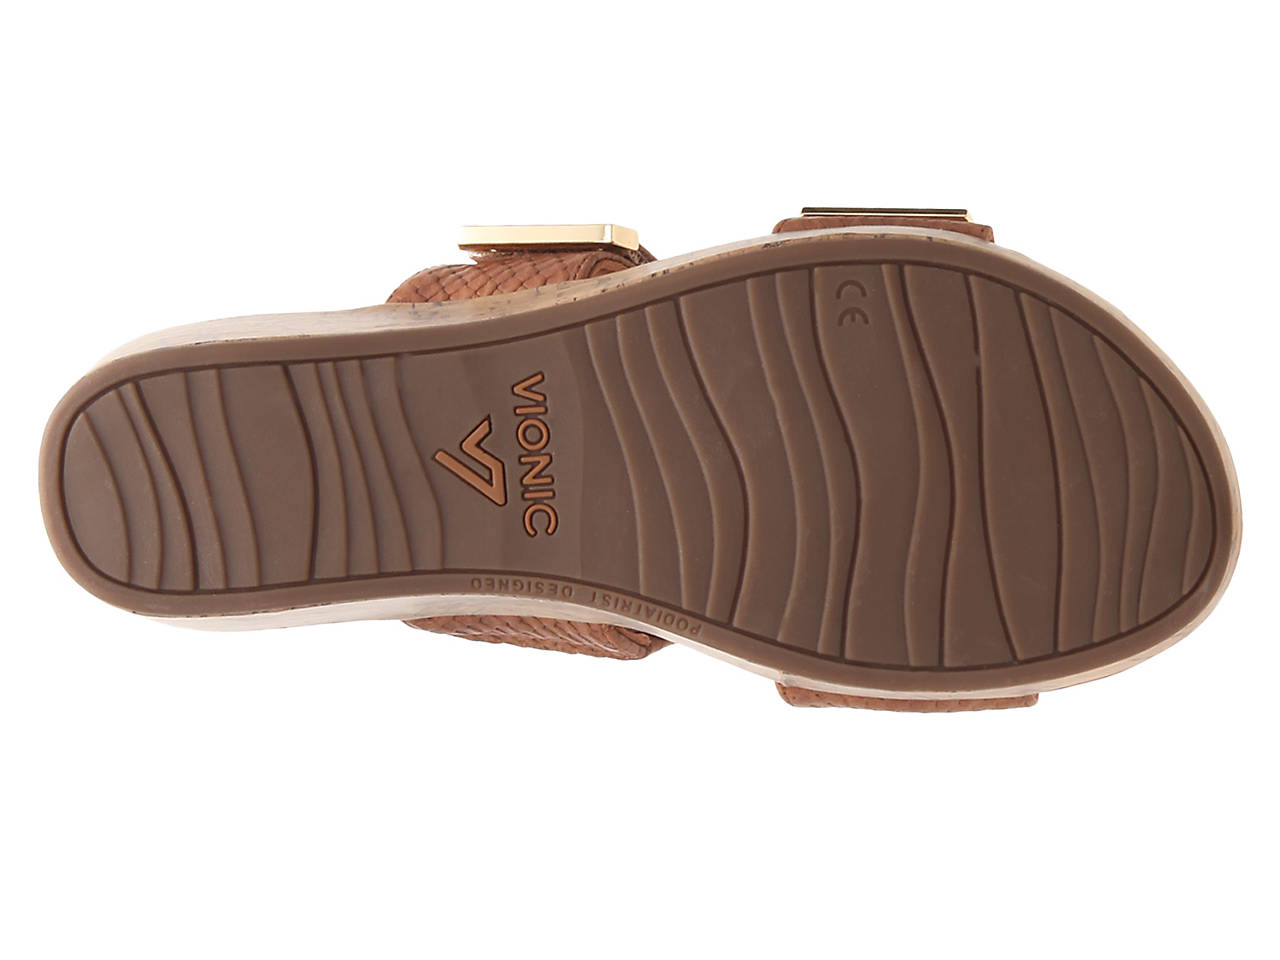 ab461ba47a Vionic Atlantic Pepper Wedge Sandal Women's Shoes   DSW